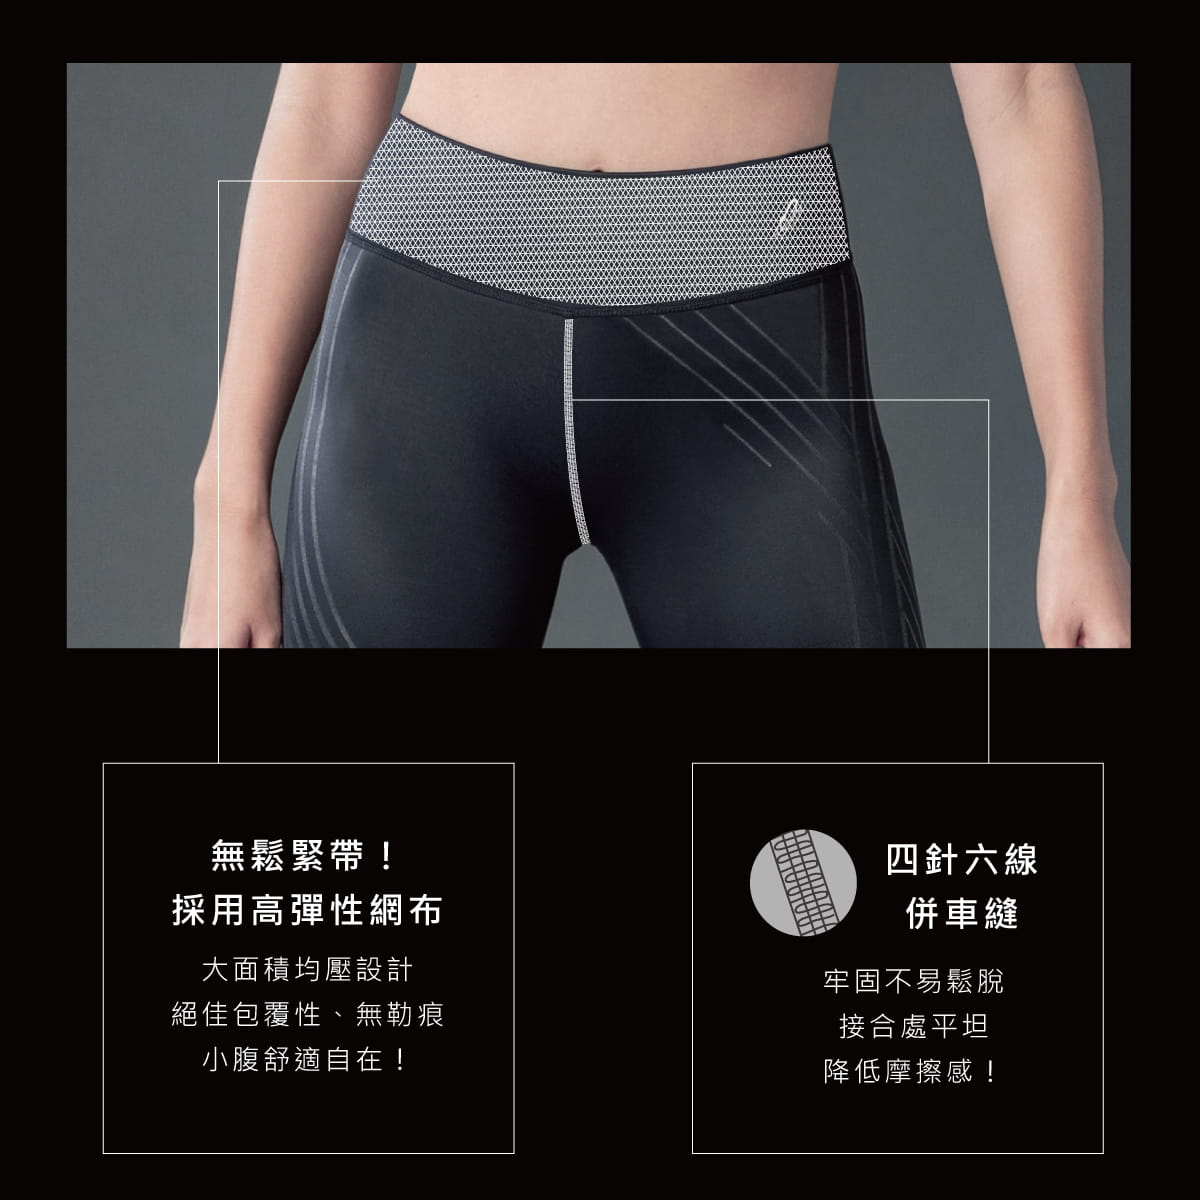 TENO超彈感美型健身褲-Track軌跡 5